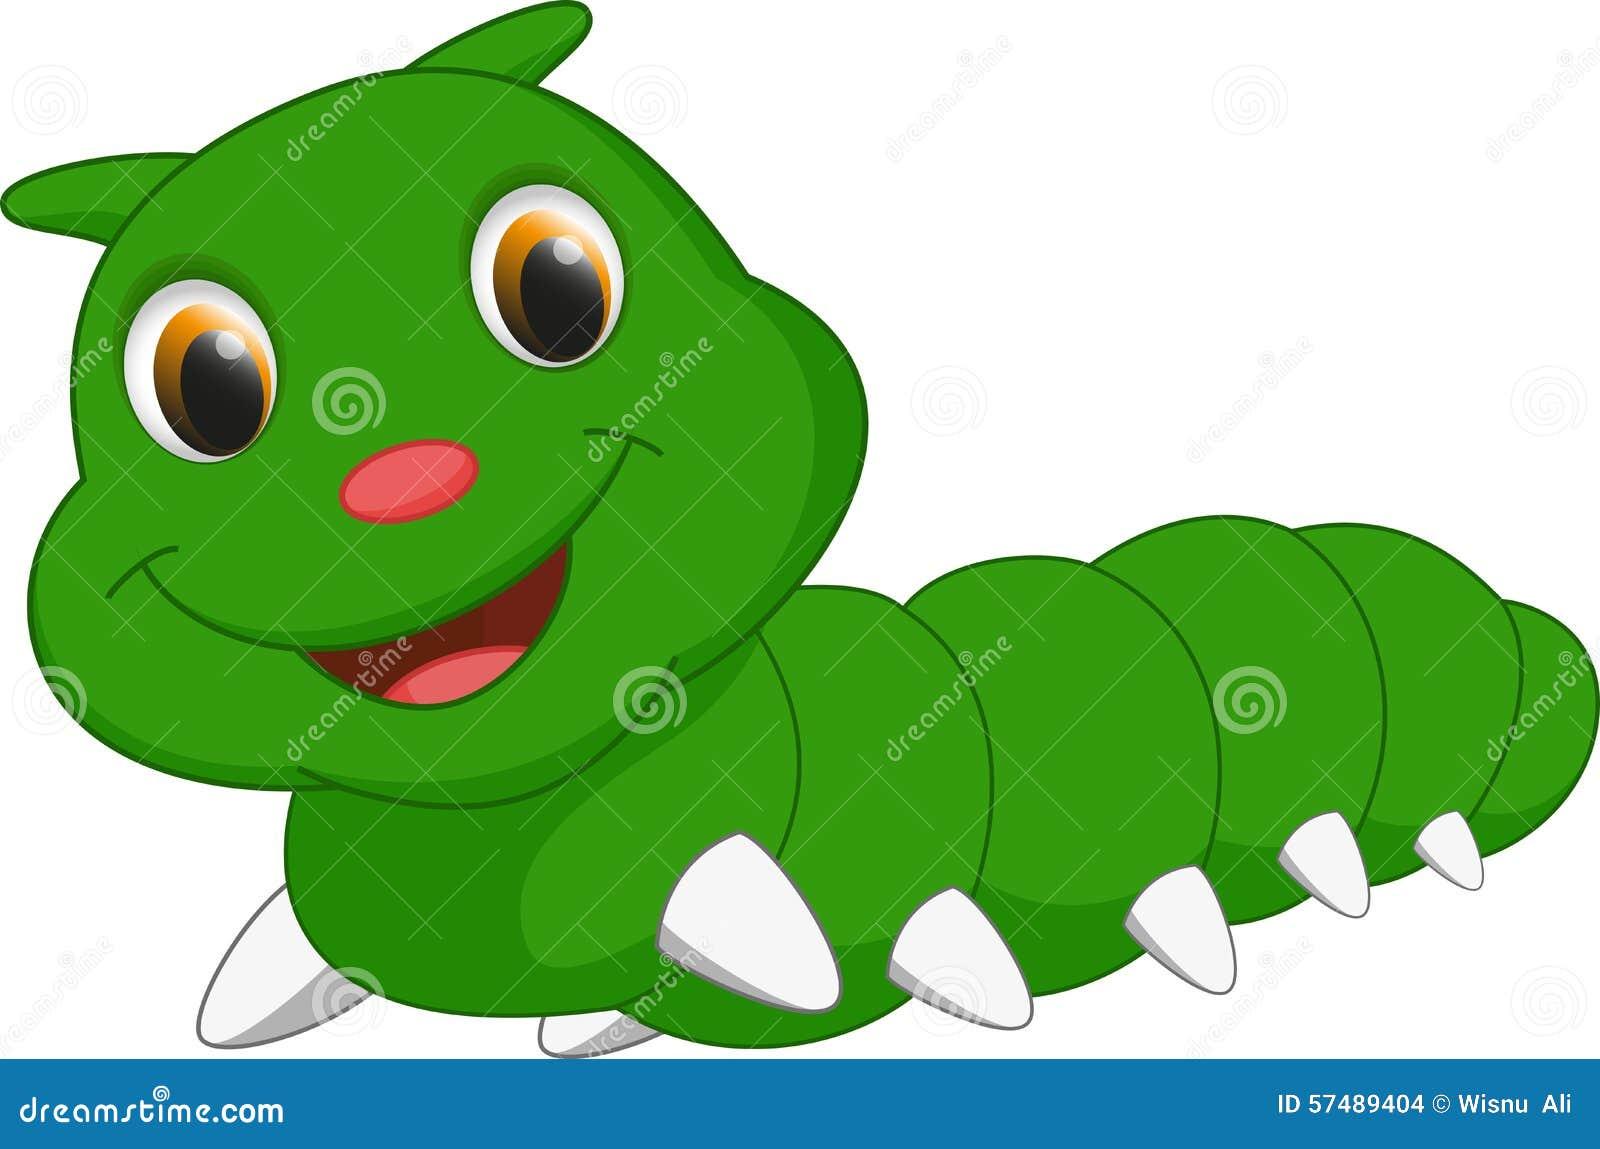 Cute caterpillar cartoon stock vector. Illustration of ... for Clipart Cute Caterpillar  155fiz